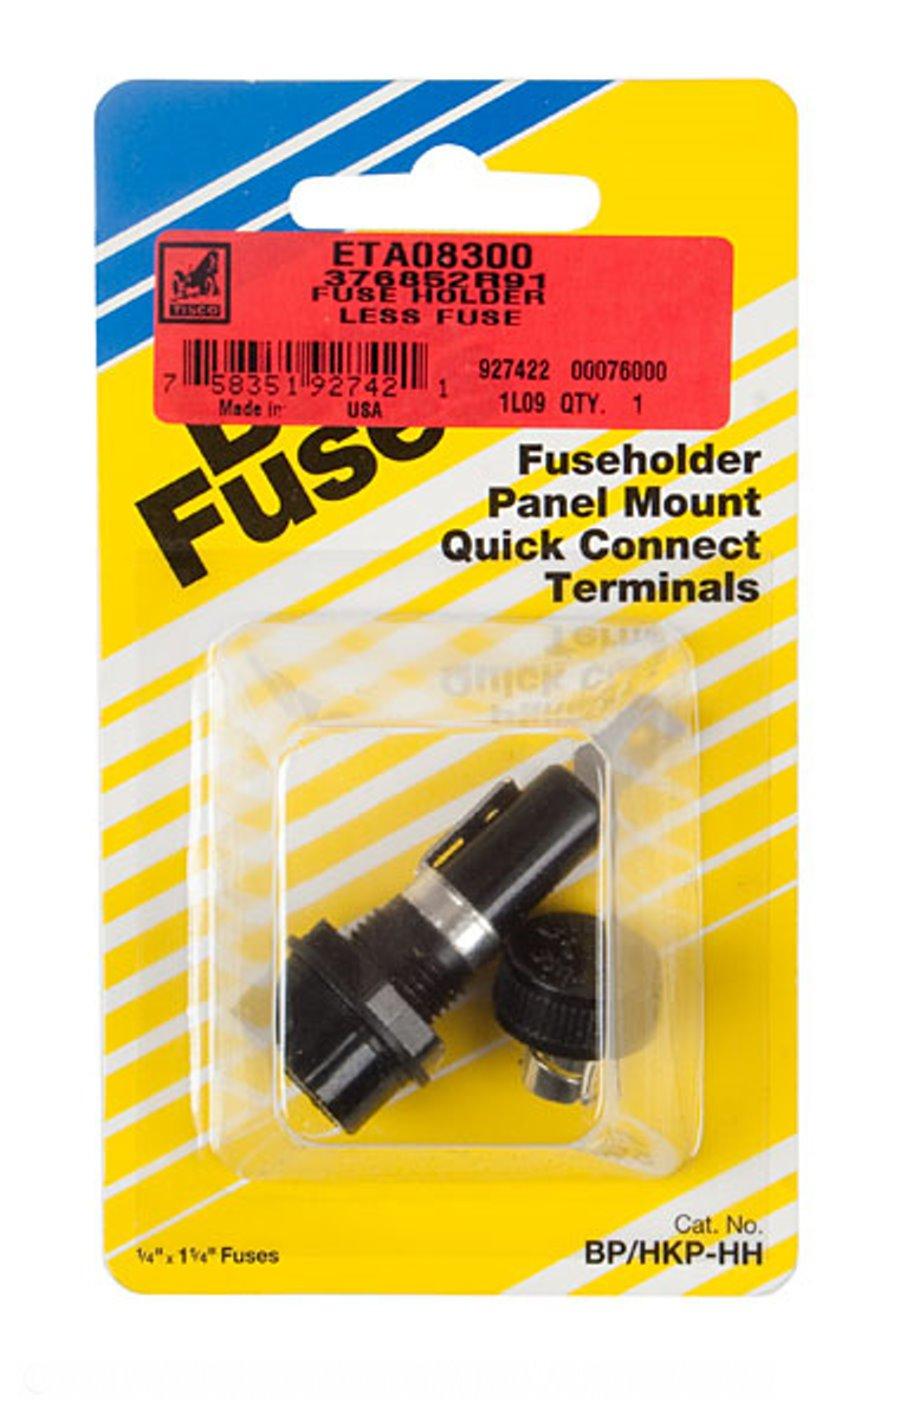 584 Inttractor Fuse Box Mastering Wiring Diagram 1066 International Tractor Amazon Com Holder Harvester 1026 1206 1256 Rh